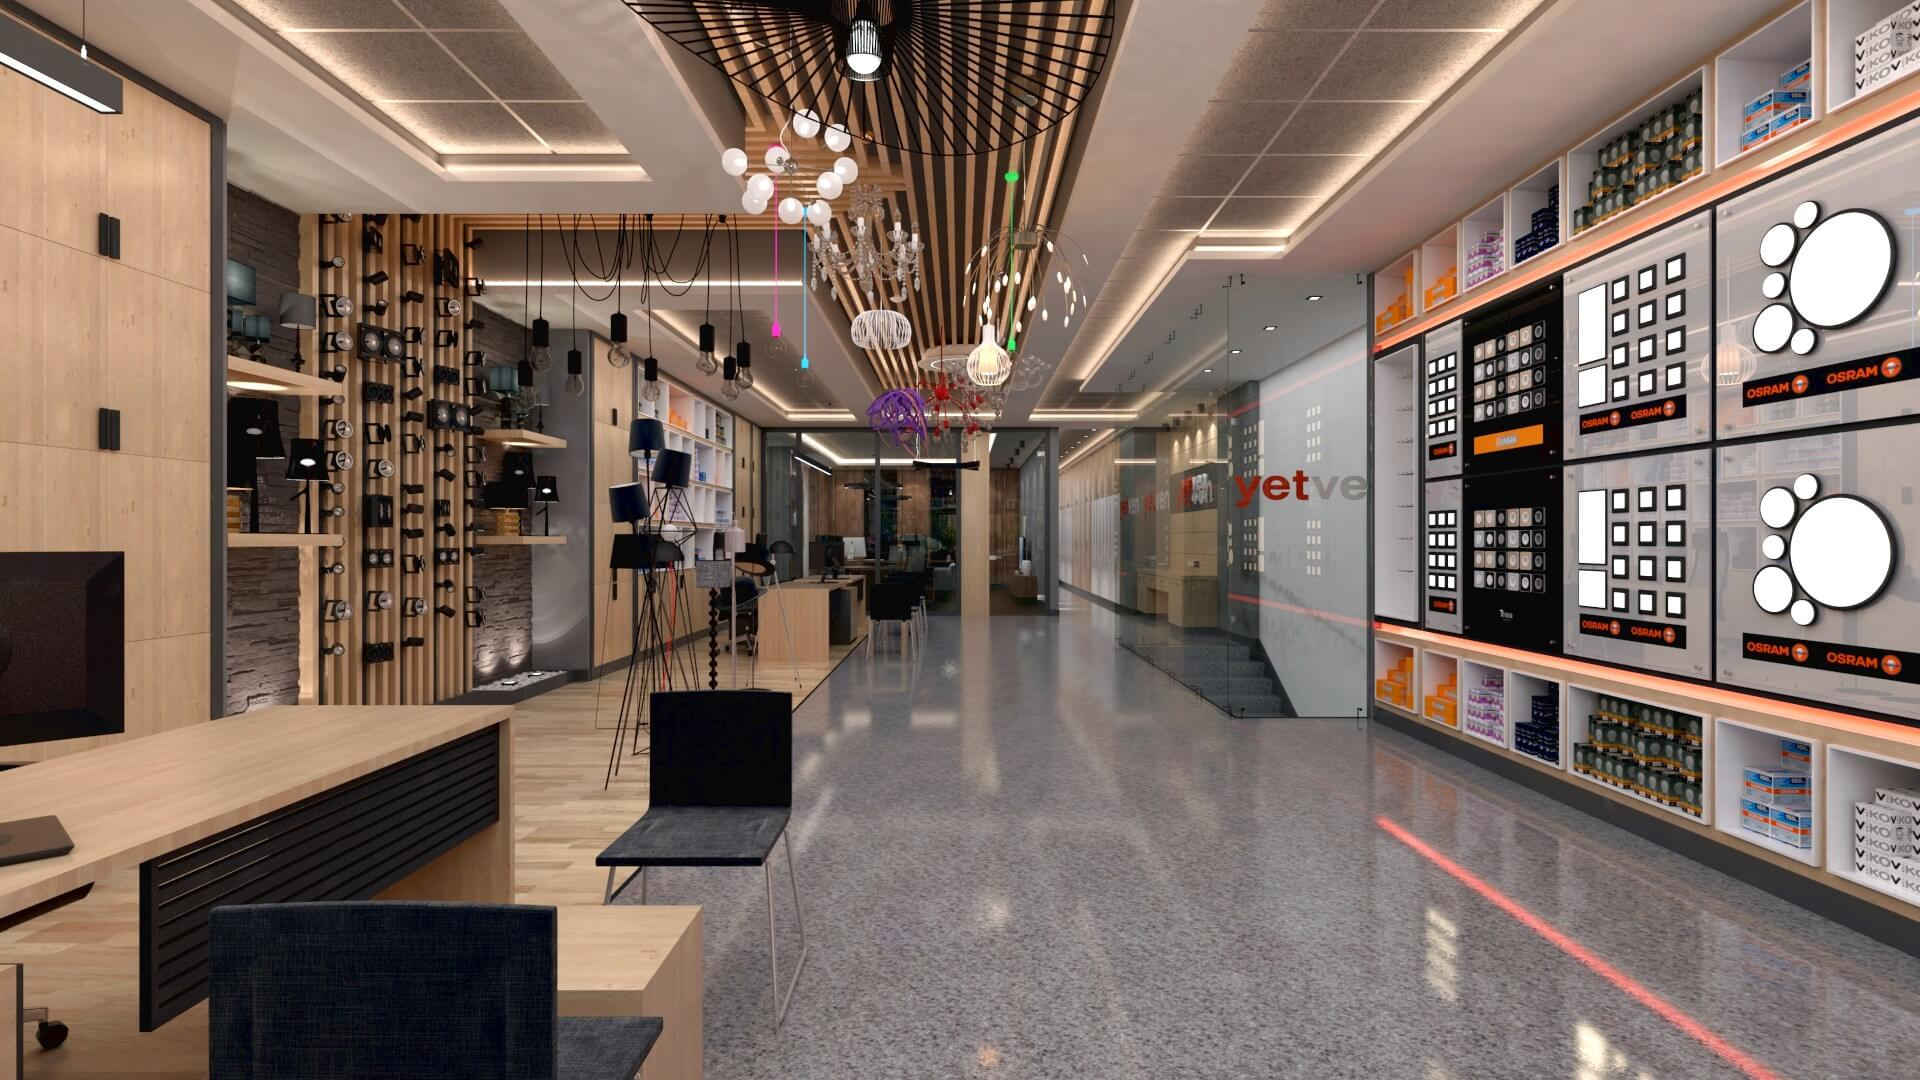 Hotel Architecture and Interior Design Yetven Electric / Ostim